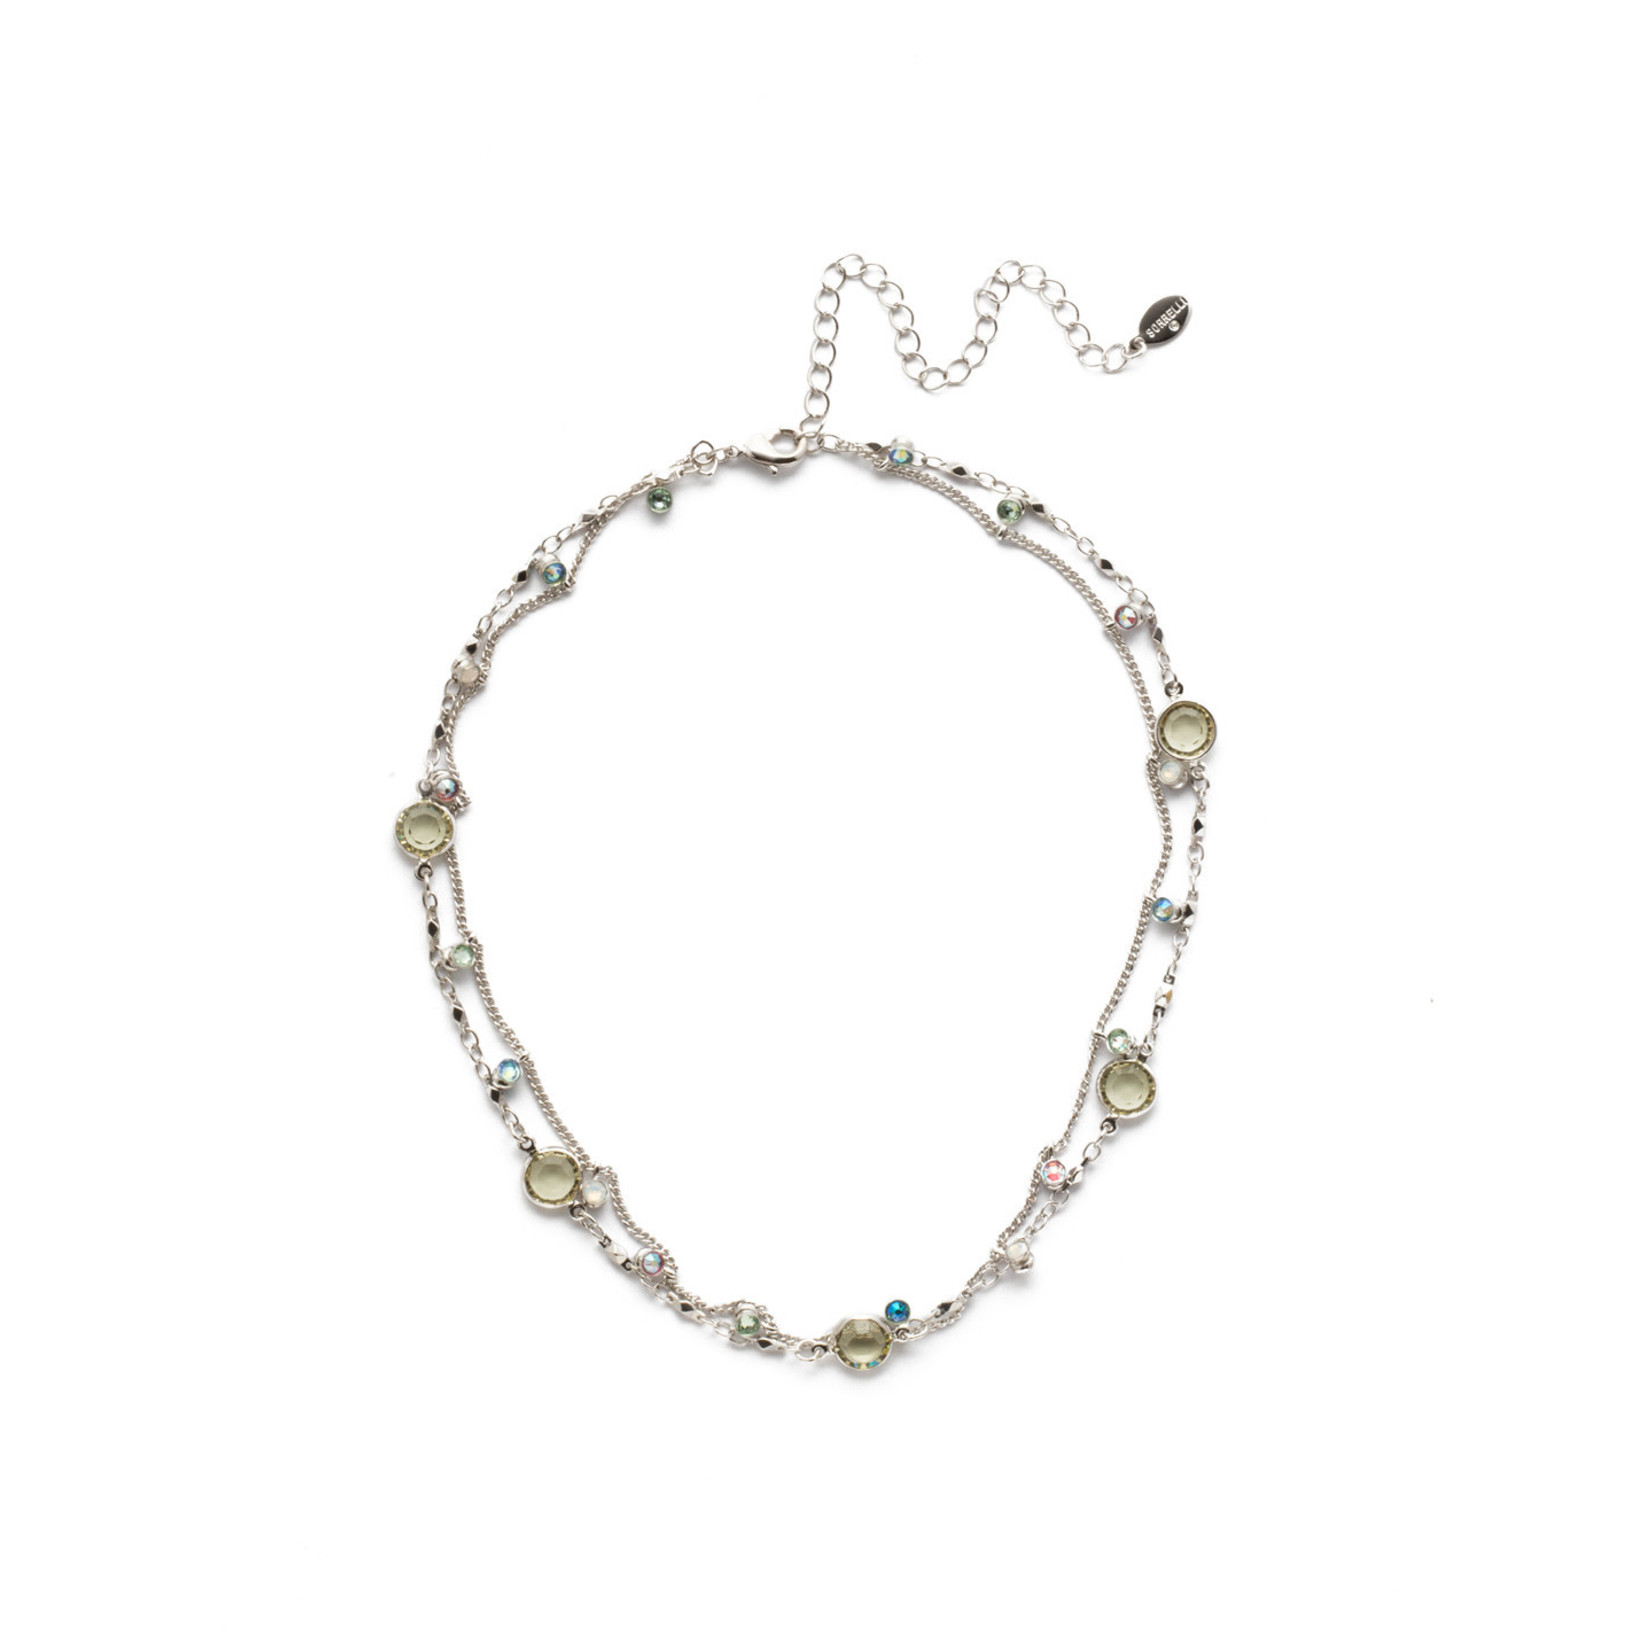 Sorrelli Sorrelli Dewdrop Layered Necklace in Rhodium Seersucker